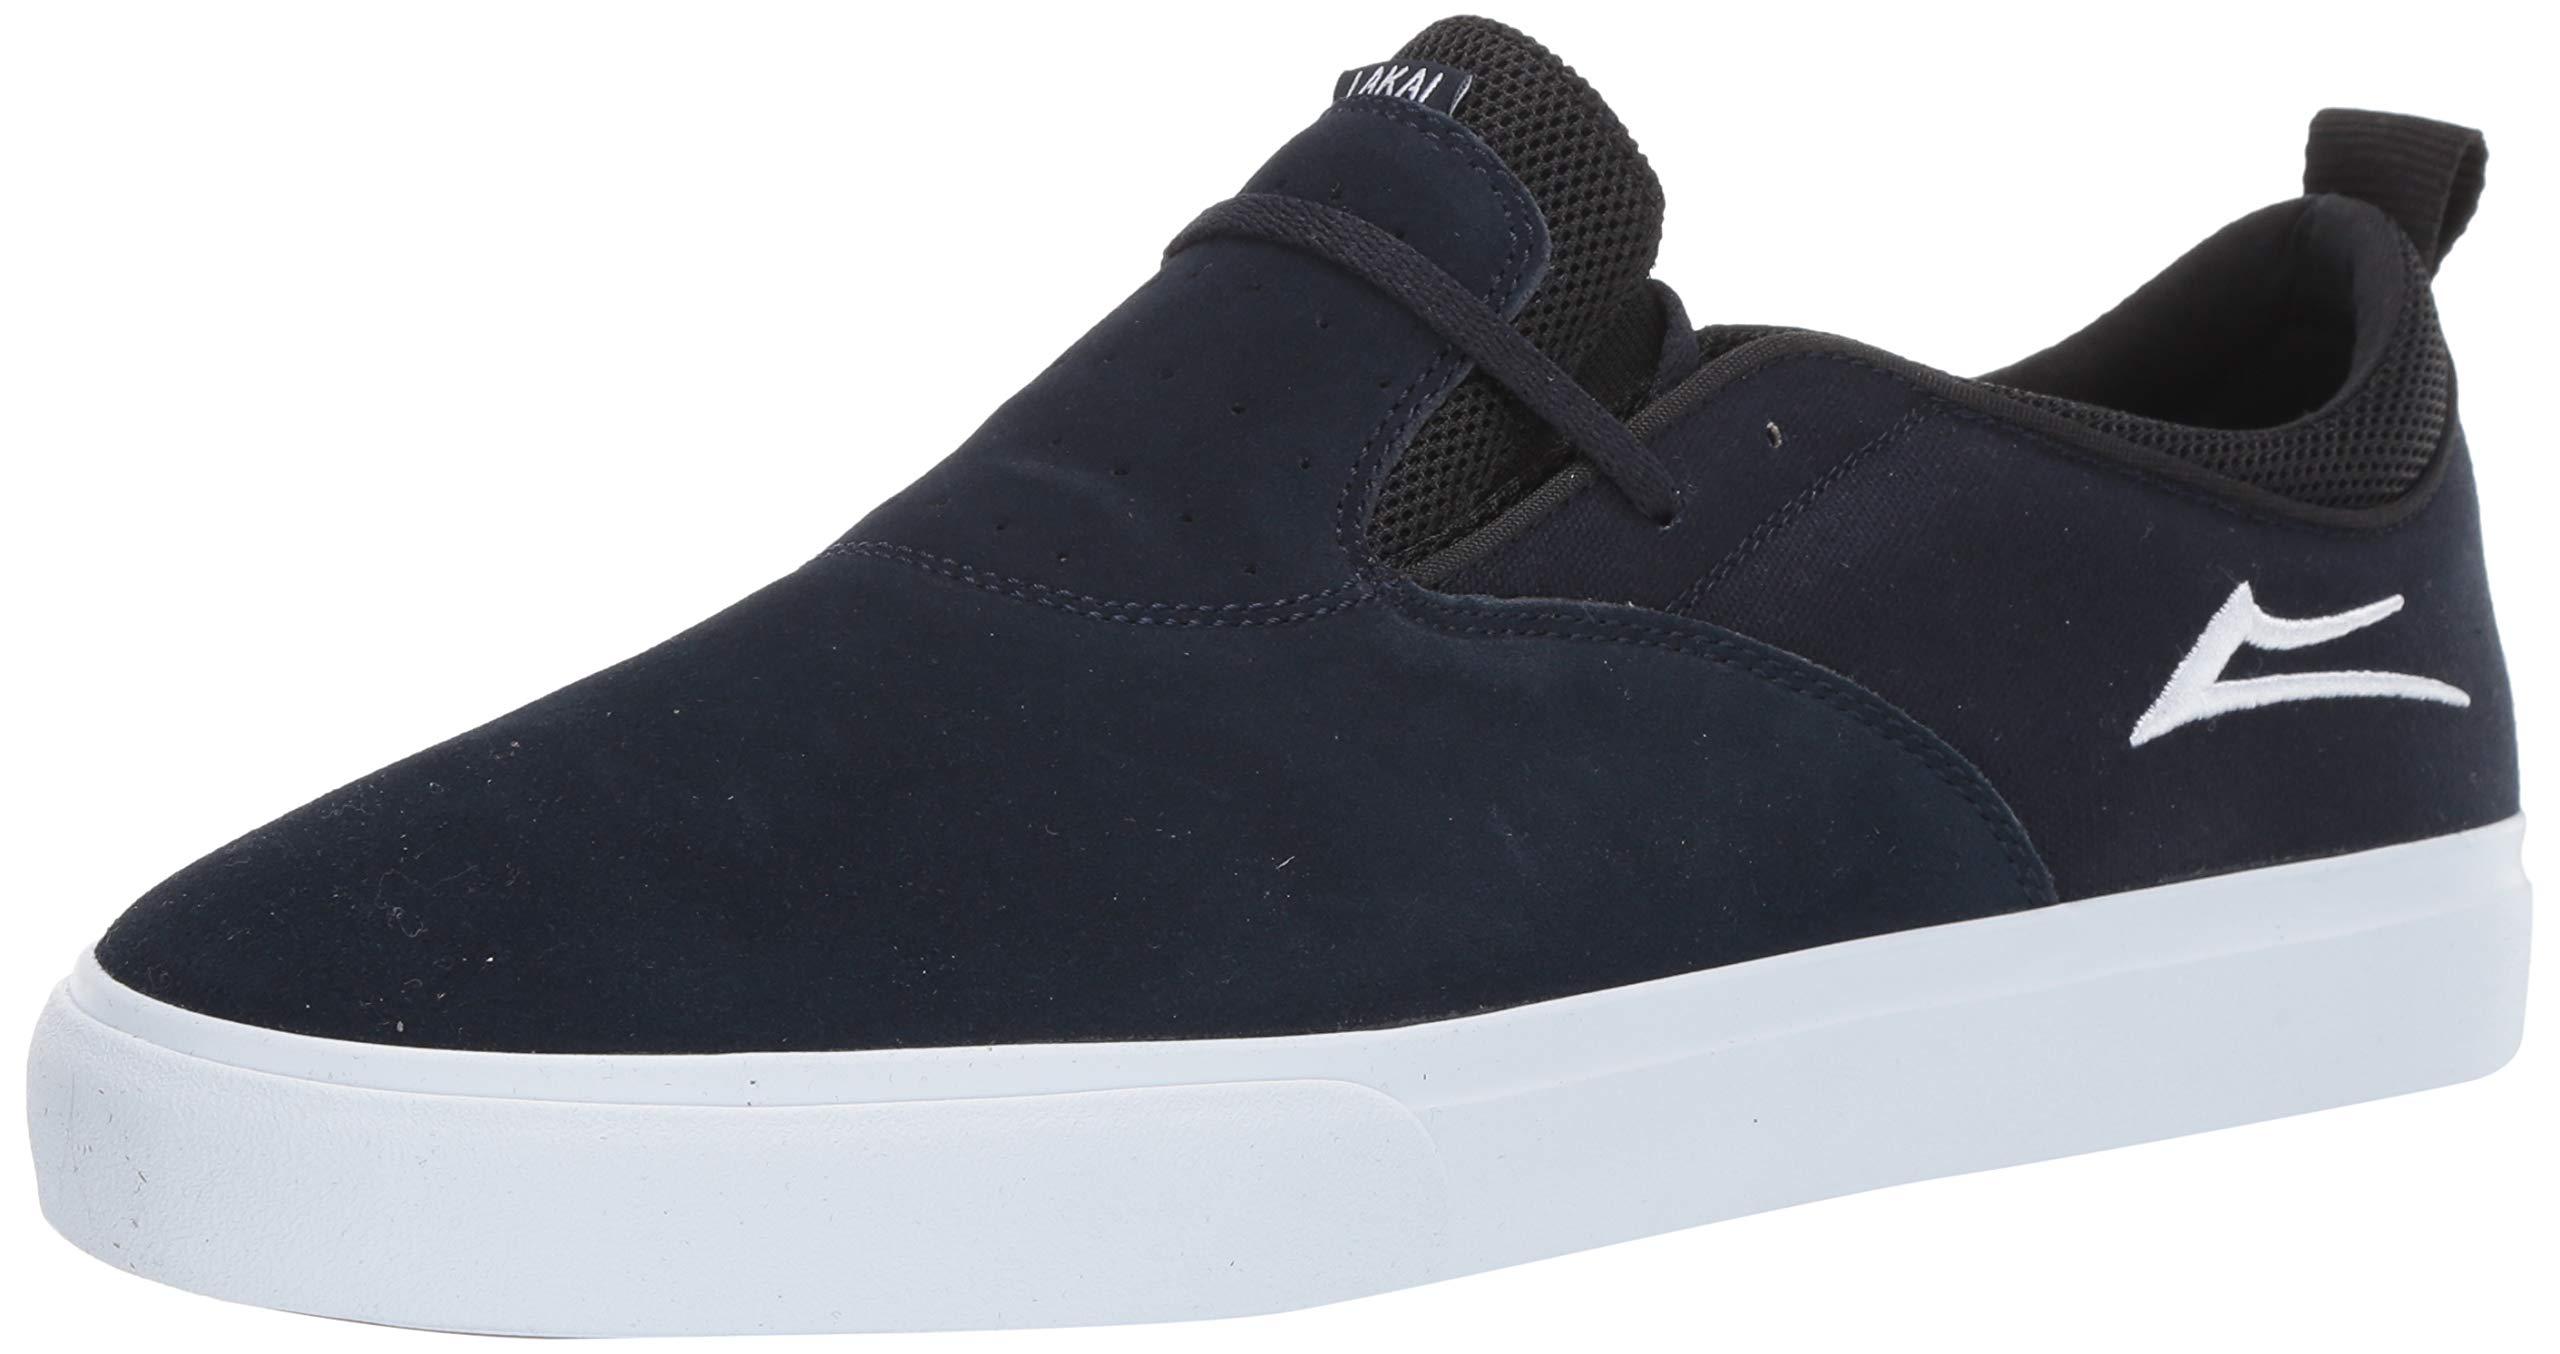 Lakai Footwear Riley 2 Navy SUEDESize 11 Tennis Shoe Suede, Standard US Width US by Lakai